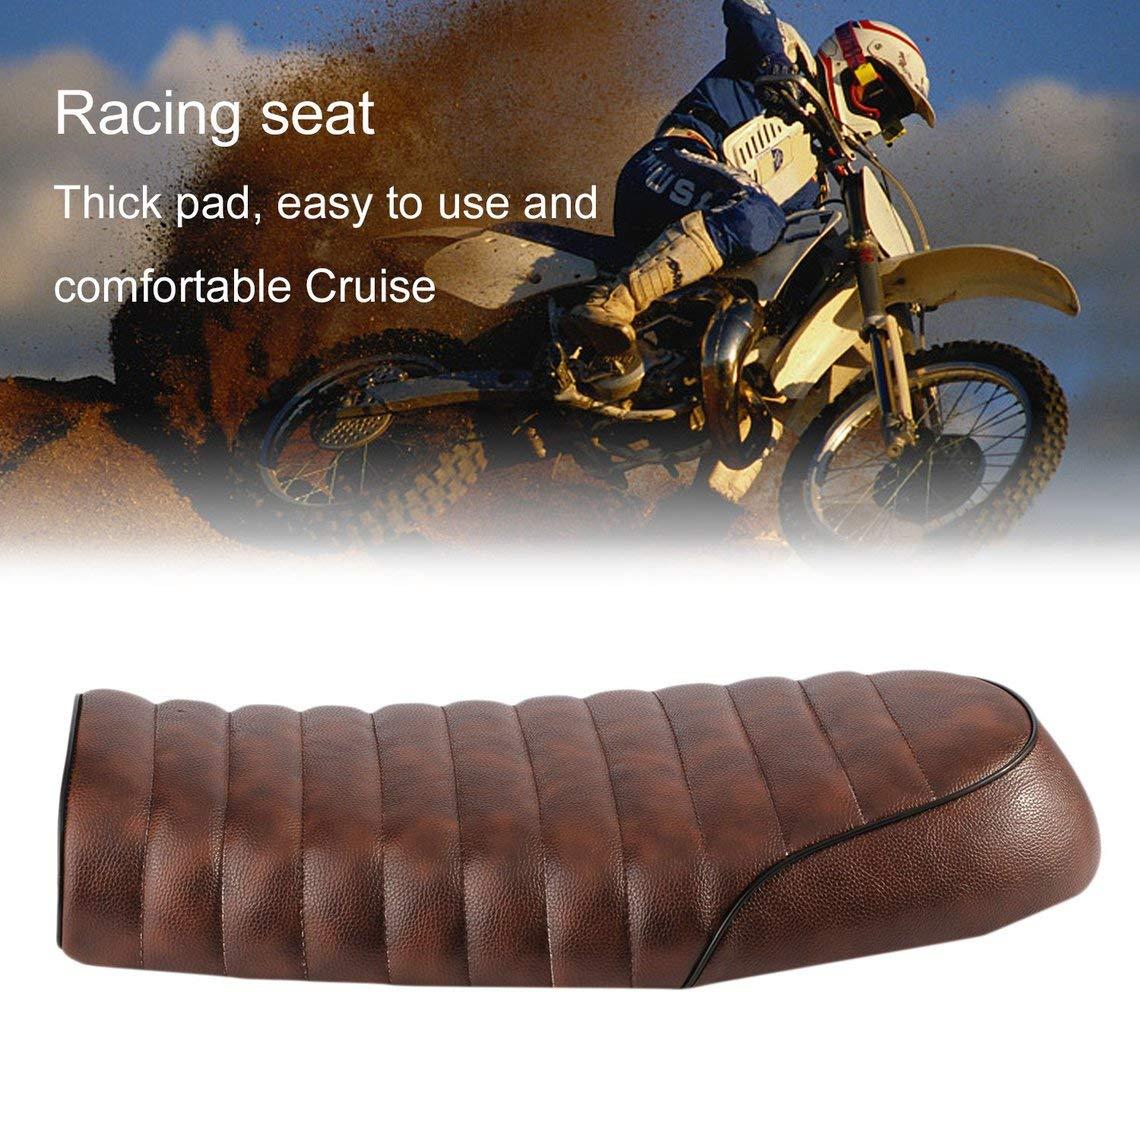 Zinniaya Universal Cafe Racer Seat impermeable de cuero acolchado con esponja para Honda CG